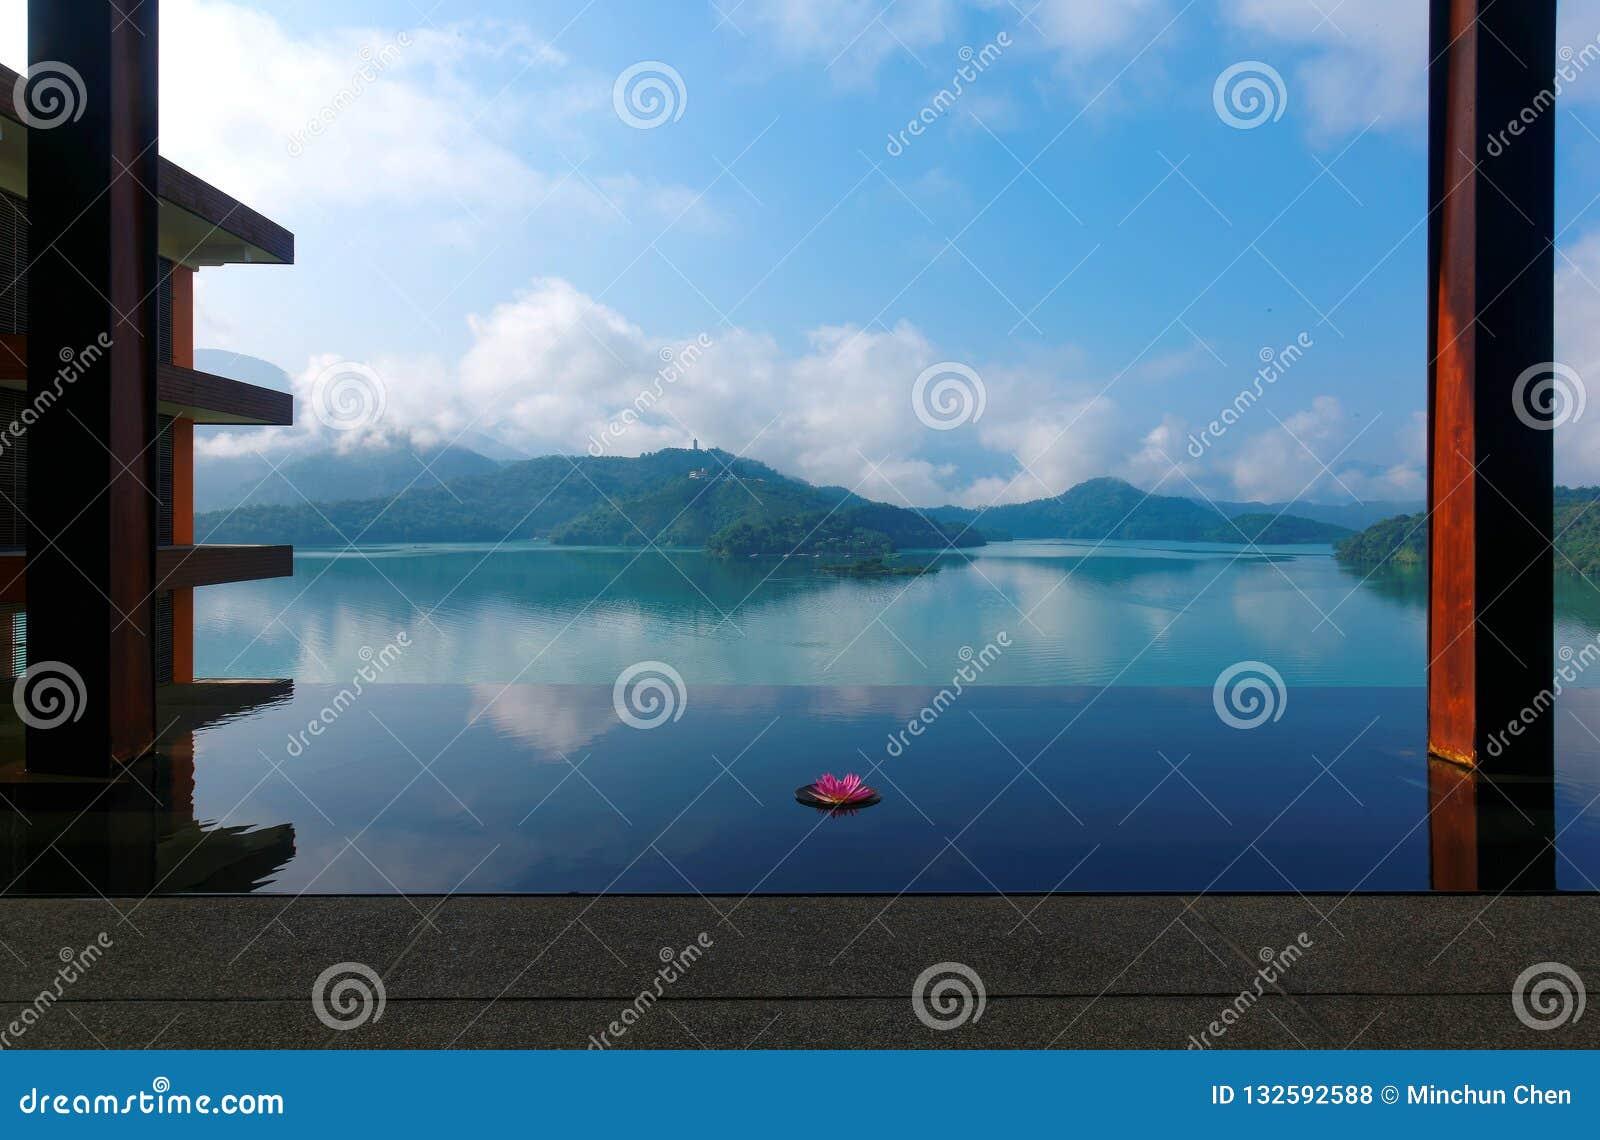 Пейзаж озера лун Солнца, известное туристское назначение в Nantou, Тайване